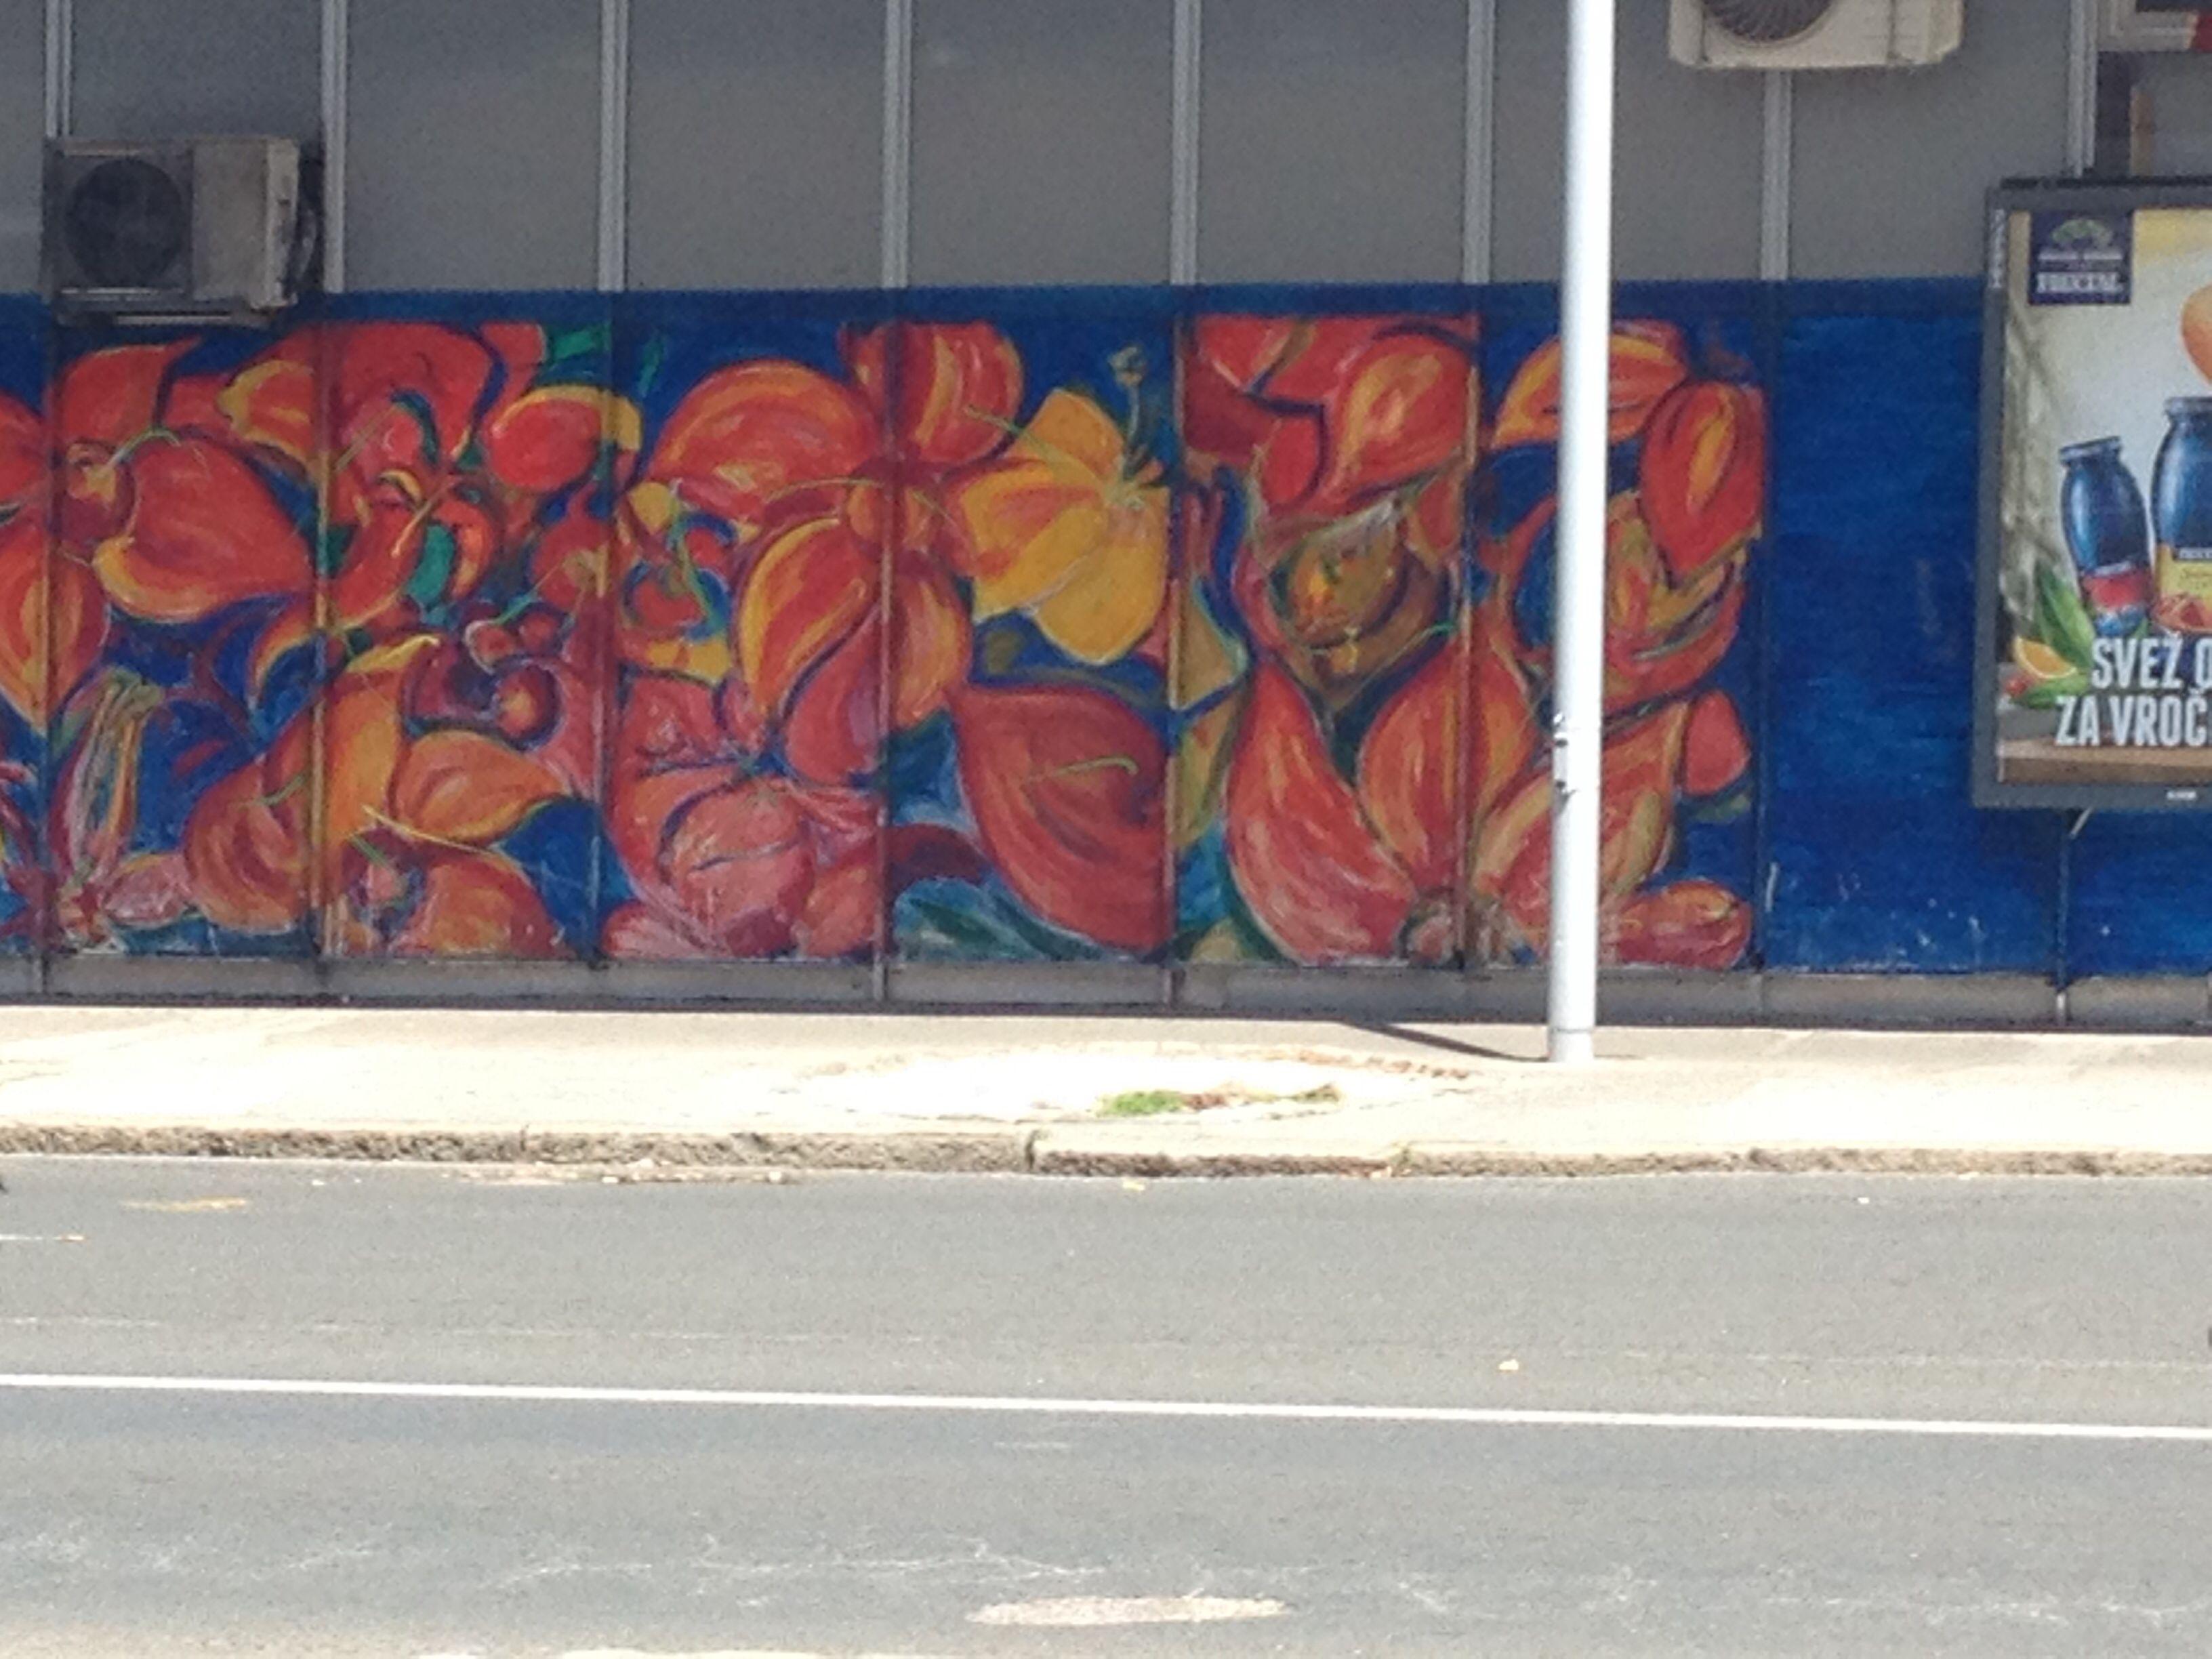 Flowers By The Bus Station In Ljubljana Street Art Graffiti Street Art Art